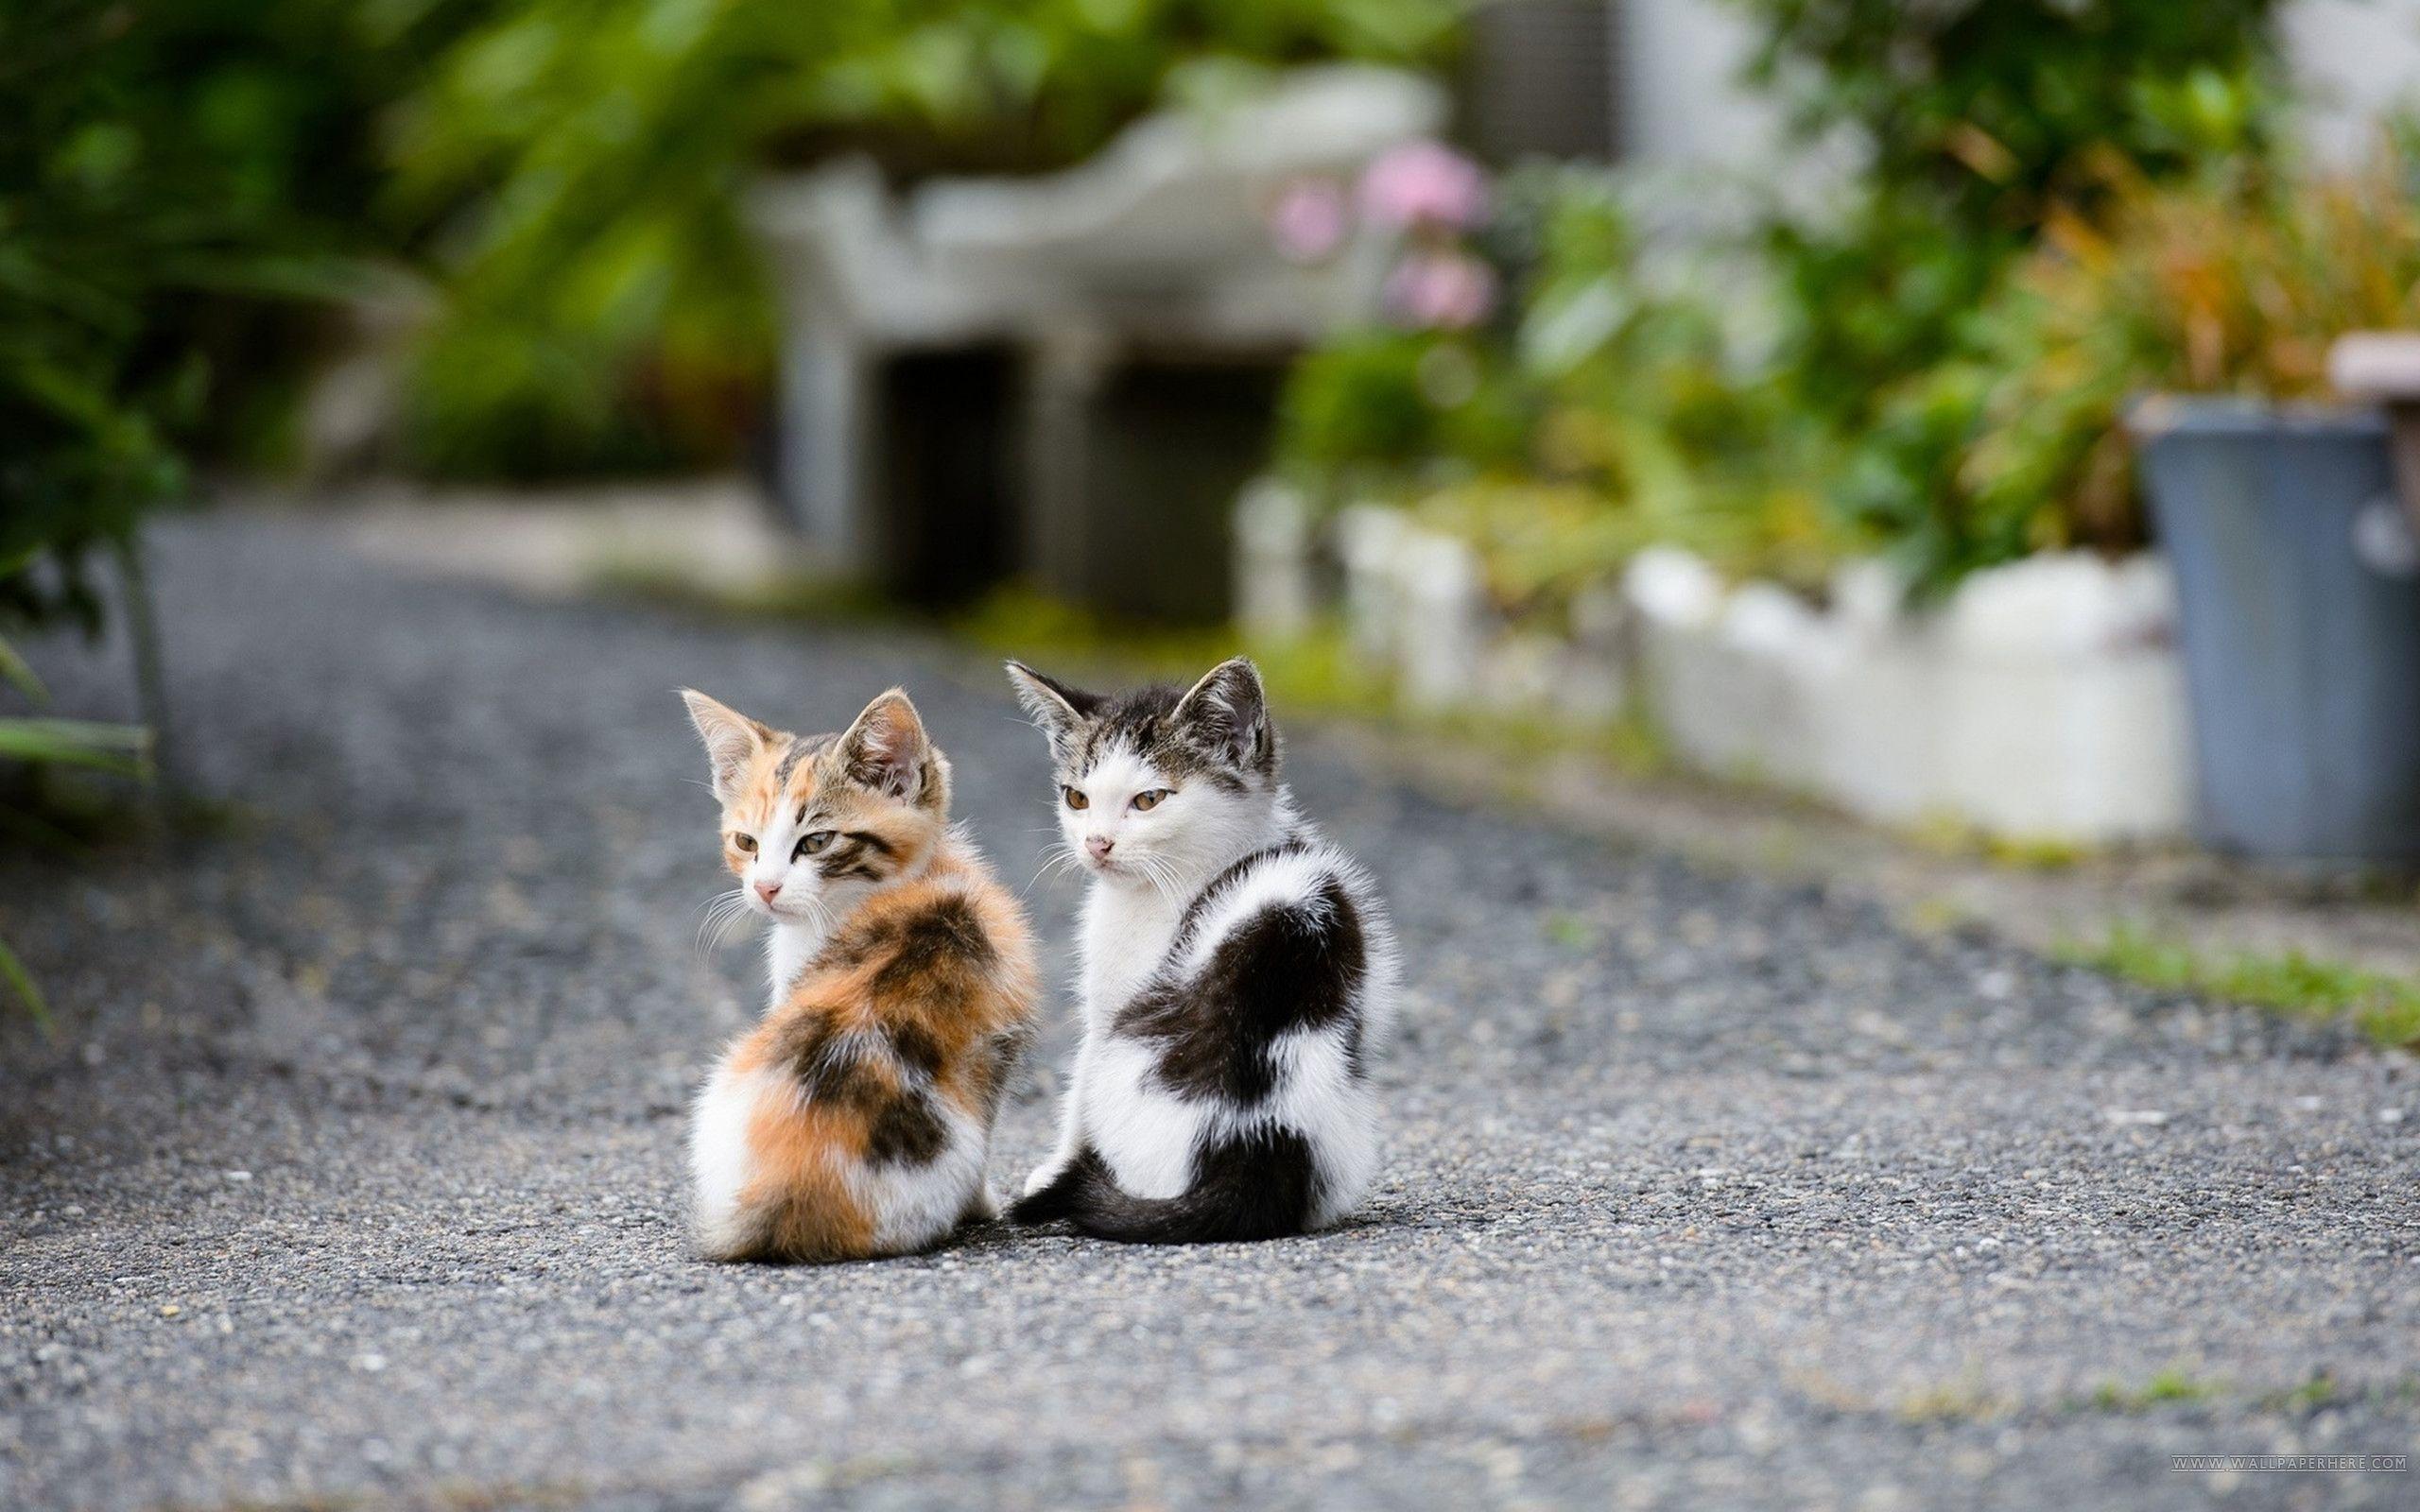 kittens - Buscar con Google